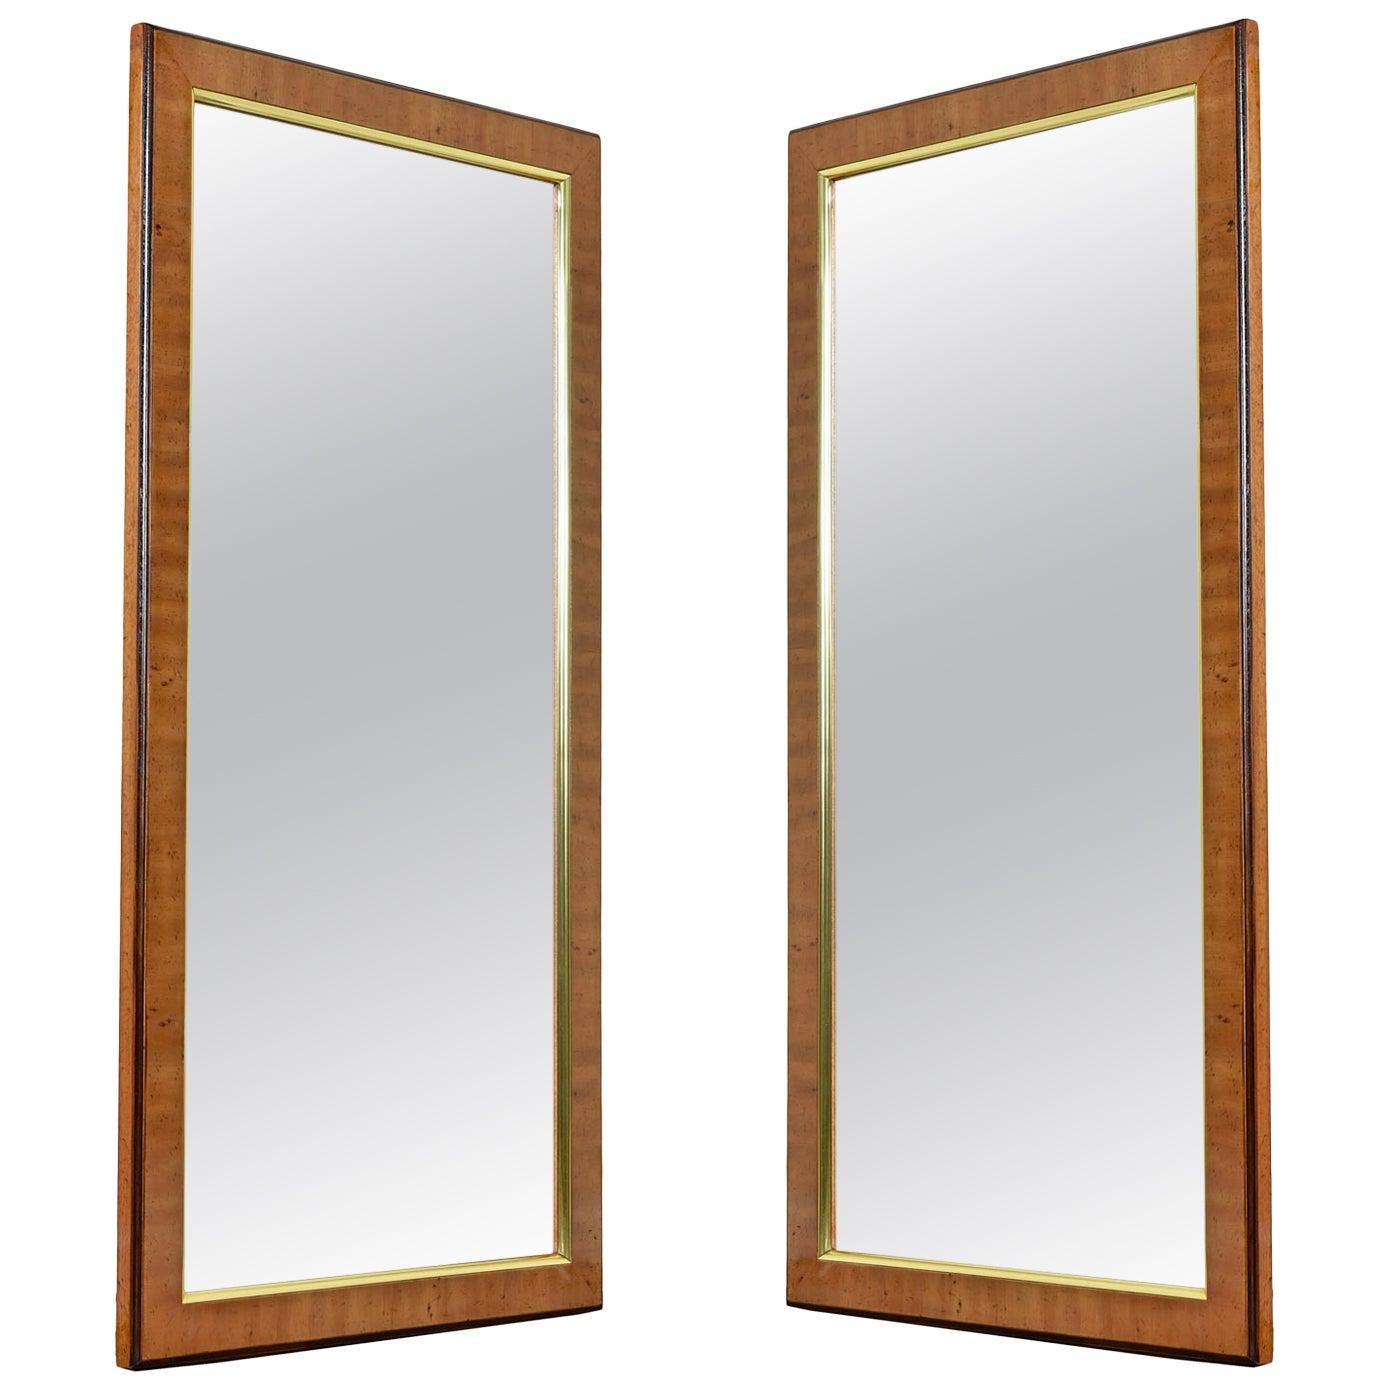 Hollywood Regency Burl Wood and Brass Drexel Heritage Avenues Mirror Set